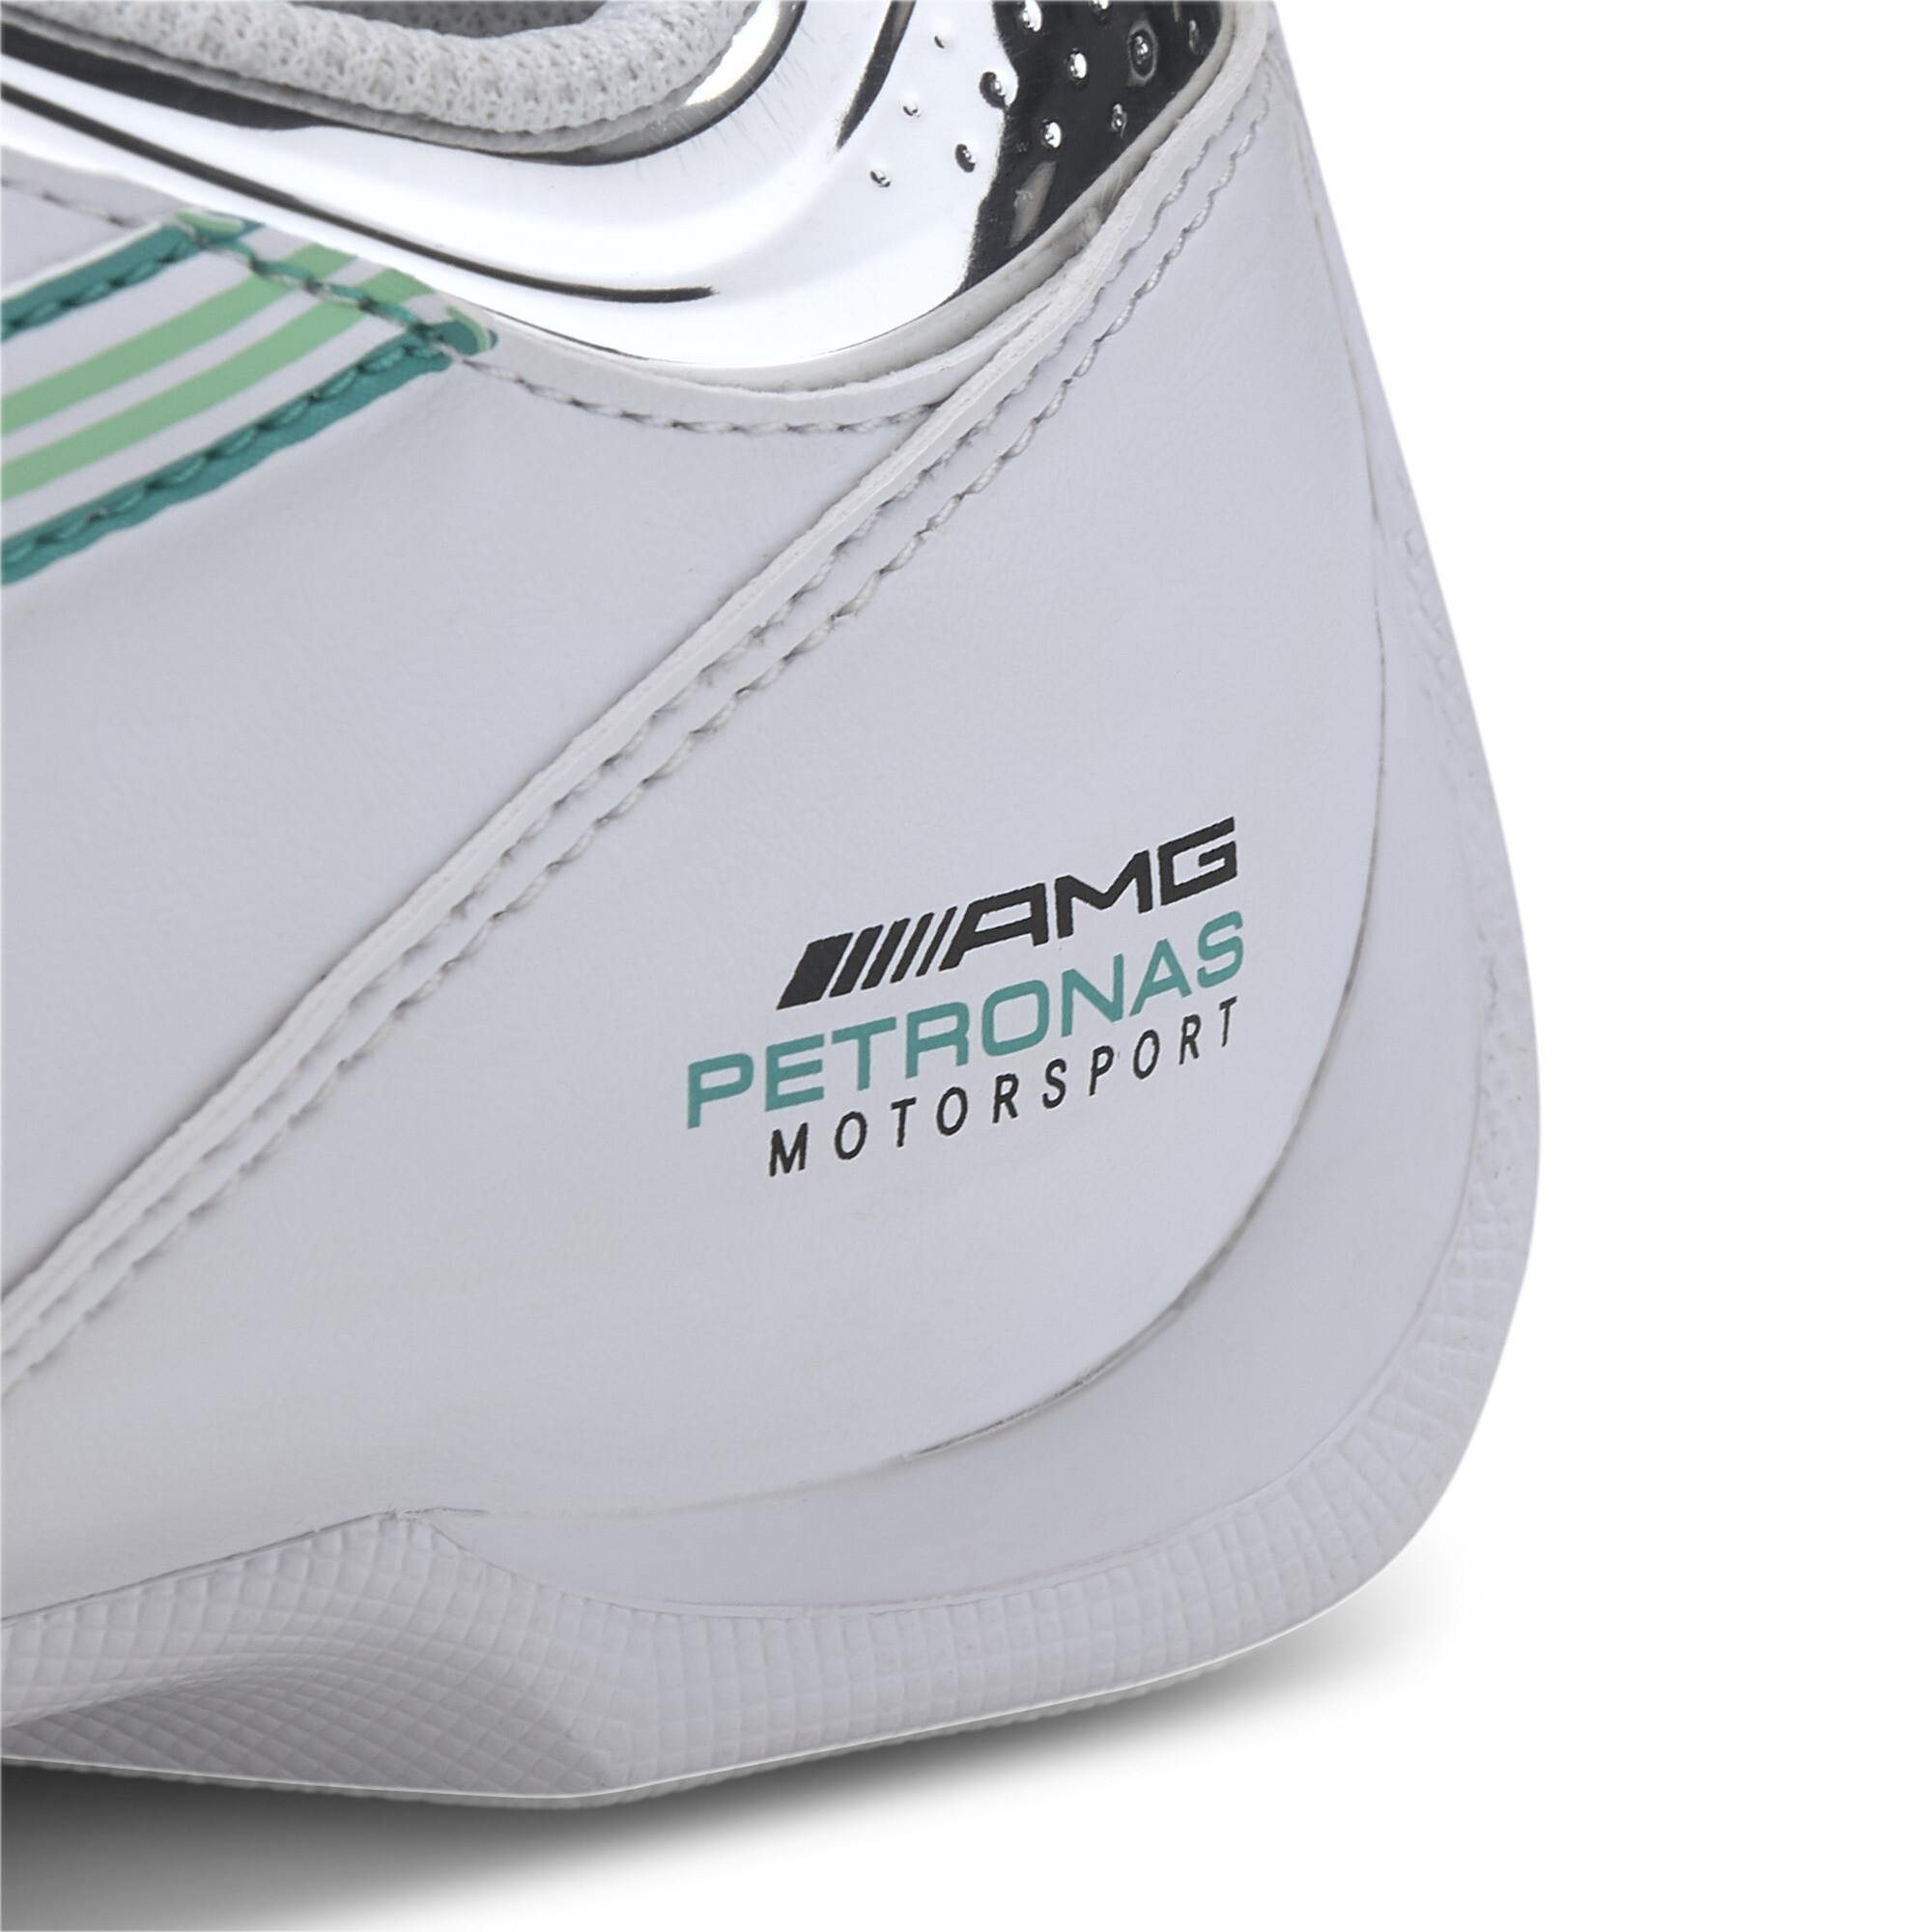 PUMA-Men-039-s-Mercedes-AMG-Petronas-Future-Kart-Cat-Shoes thumbnail 9